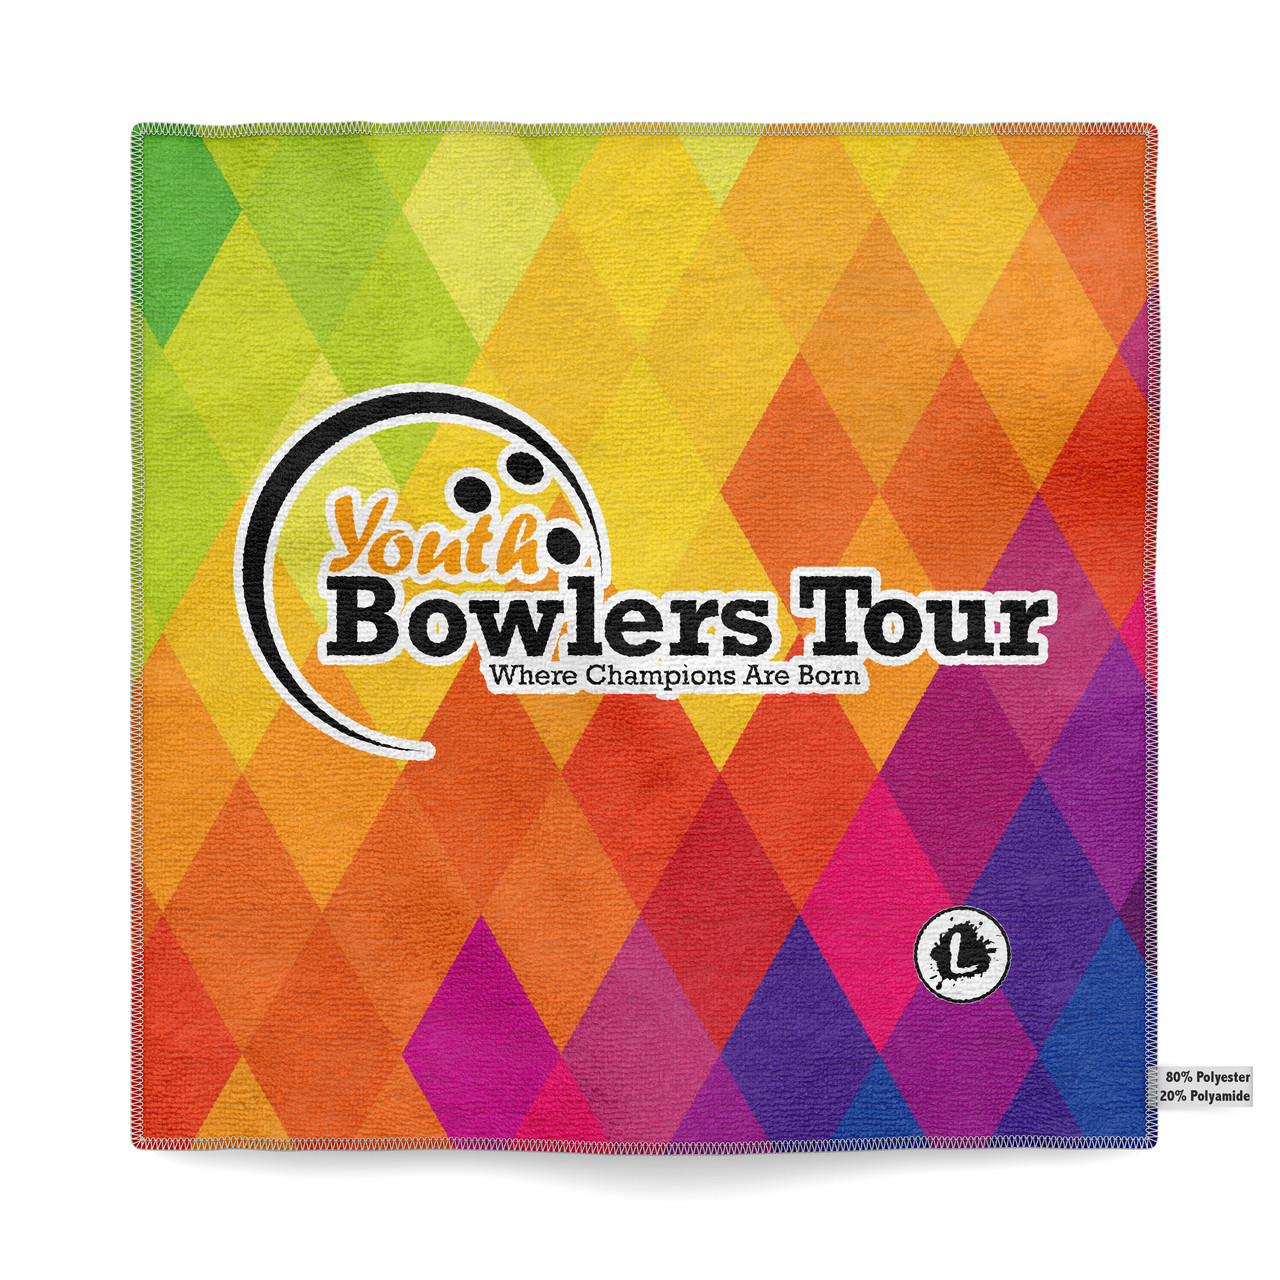 Youth Bowlers Tour - YBT - Microfiber Towel - YBT001